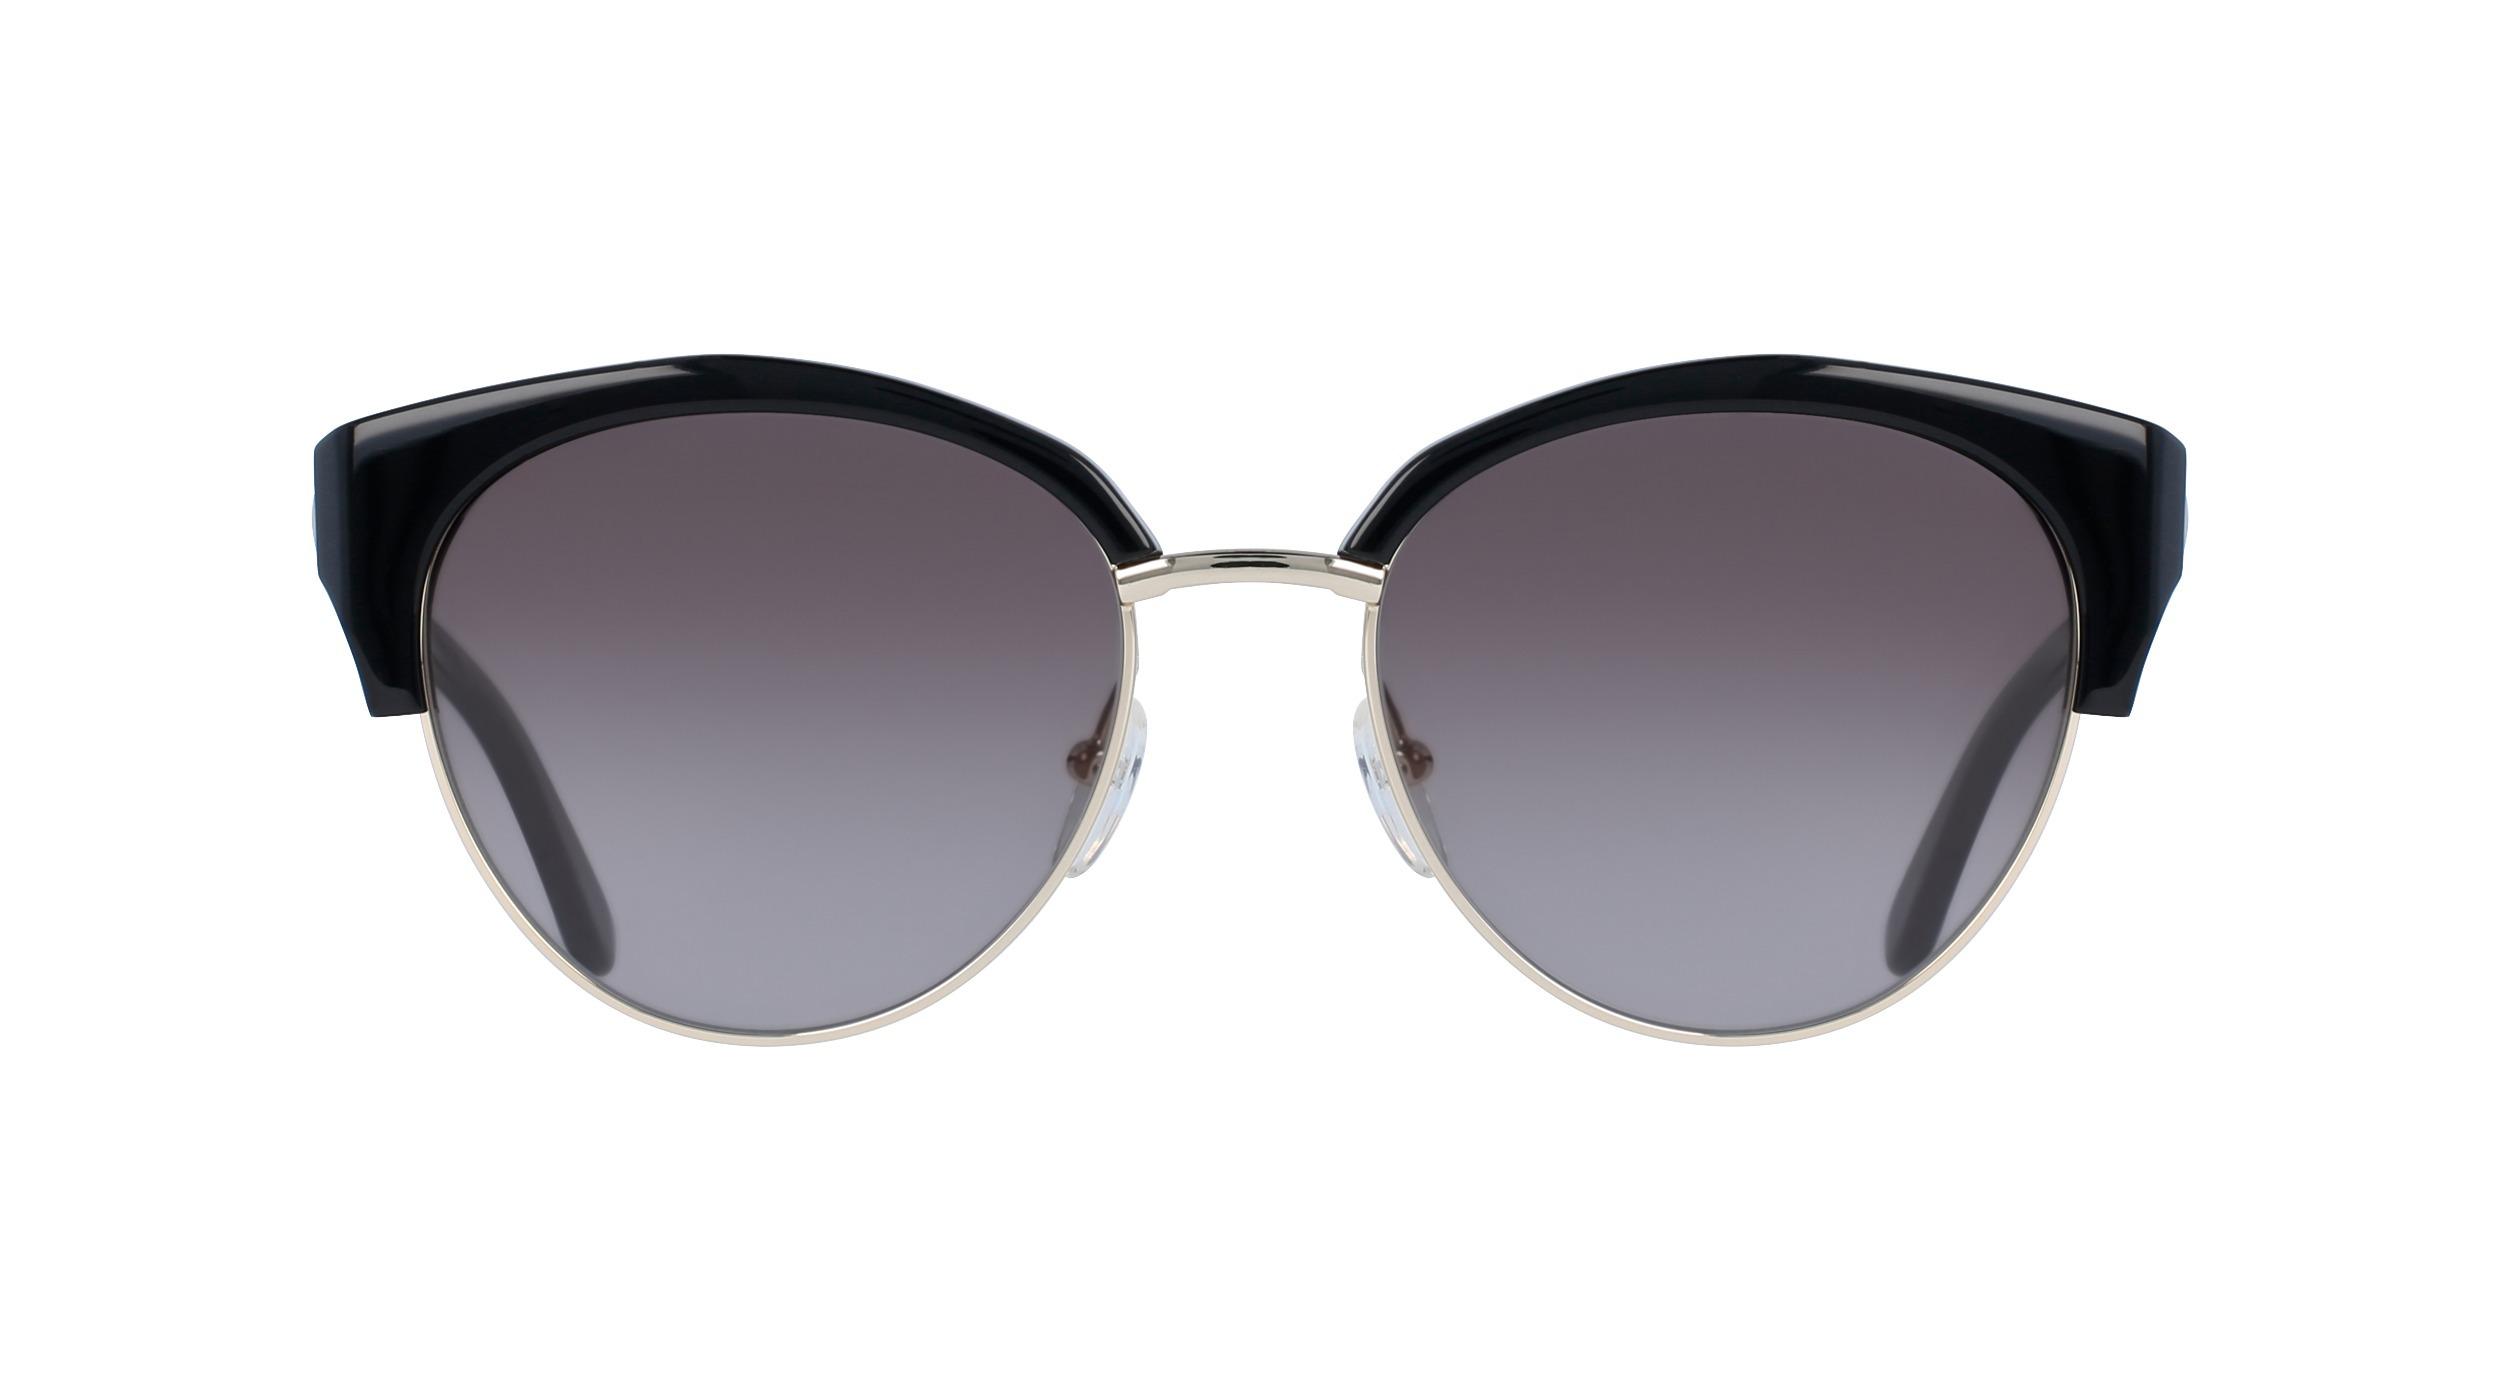 optic2000-lunettes-soleil-karl-lagerfeld